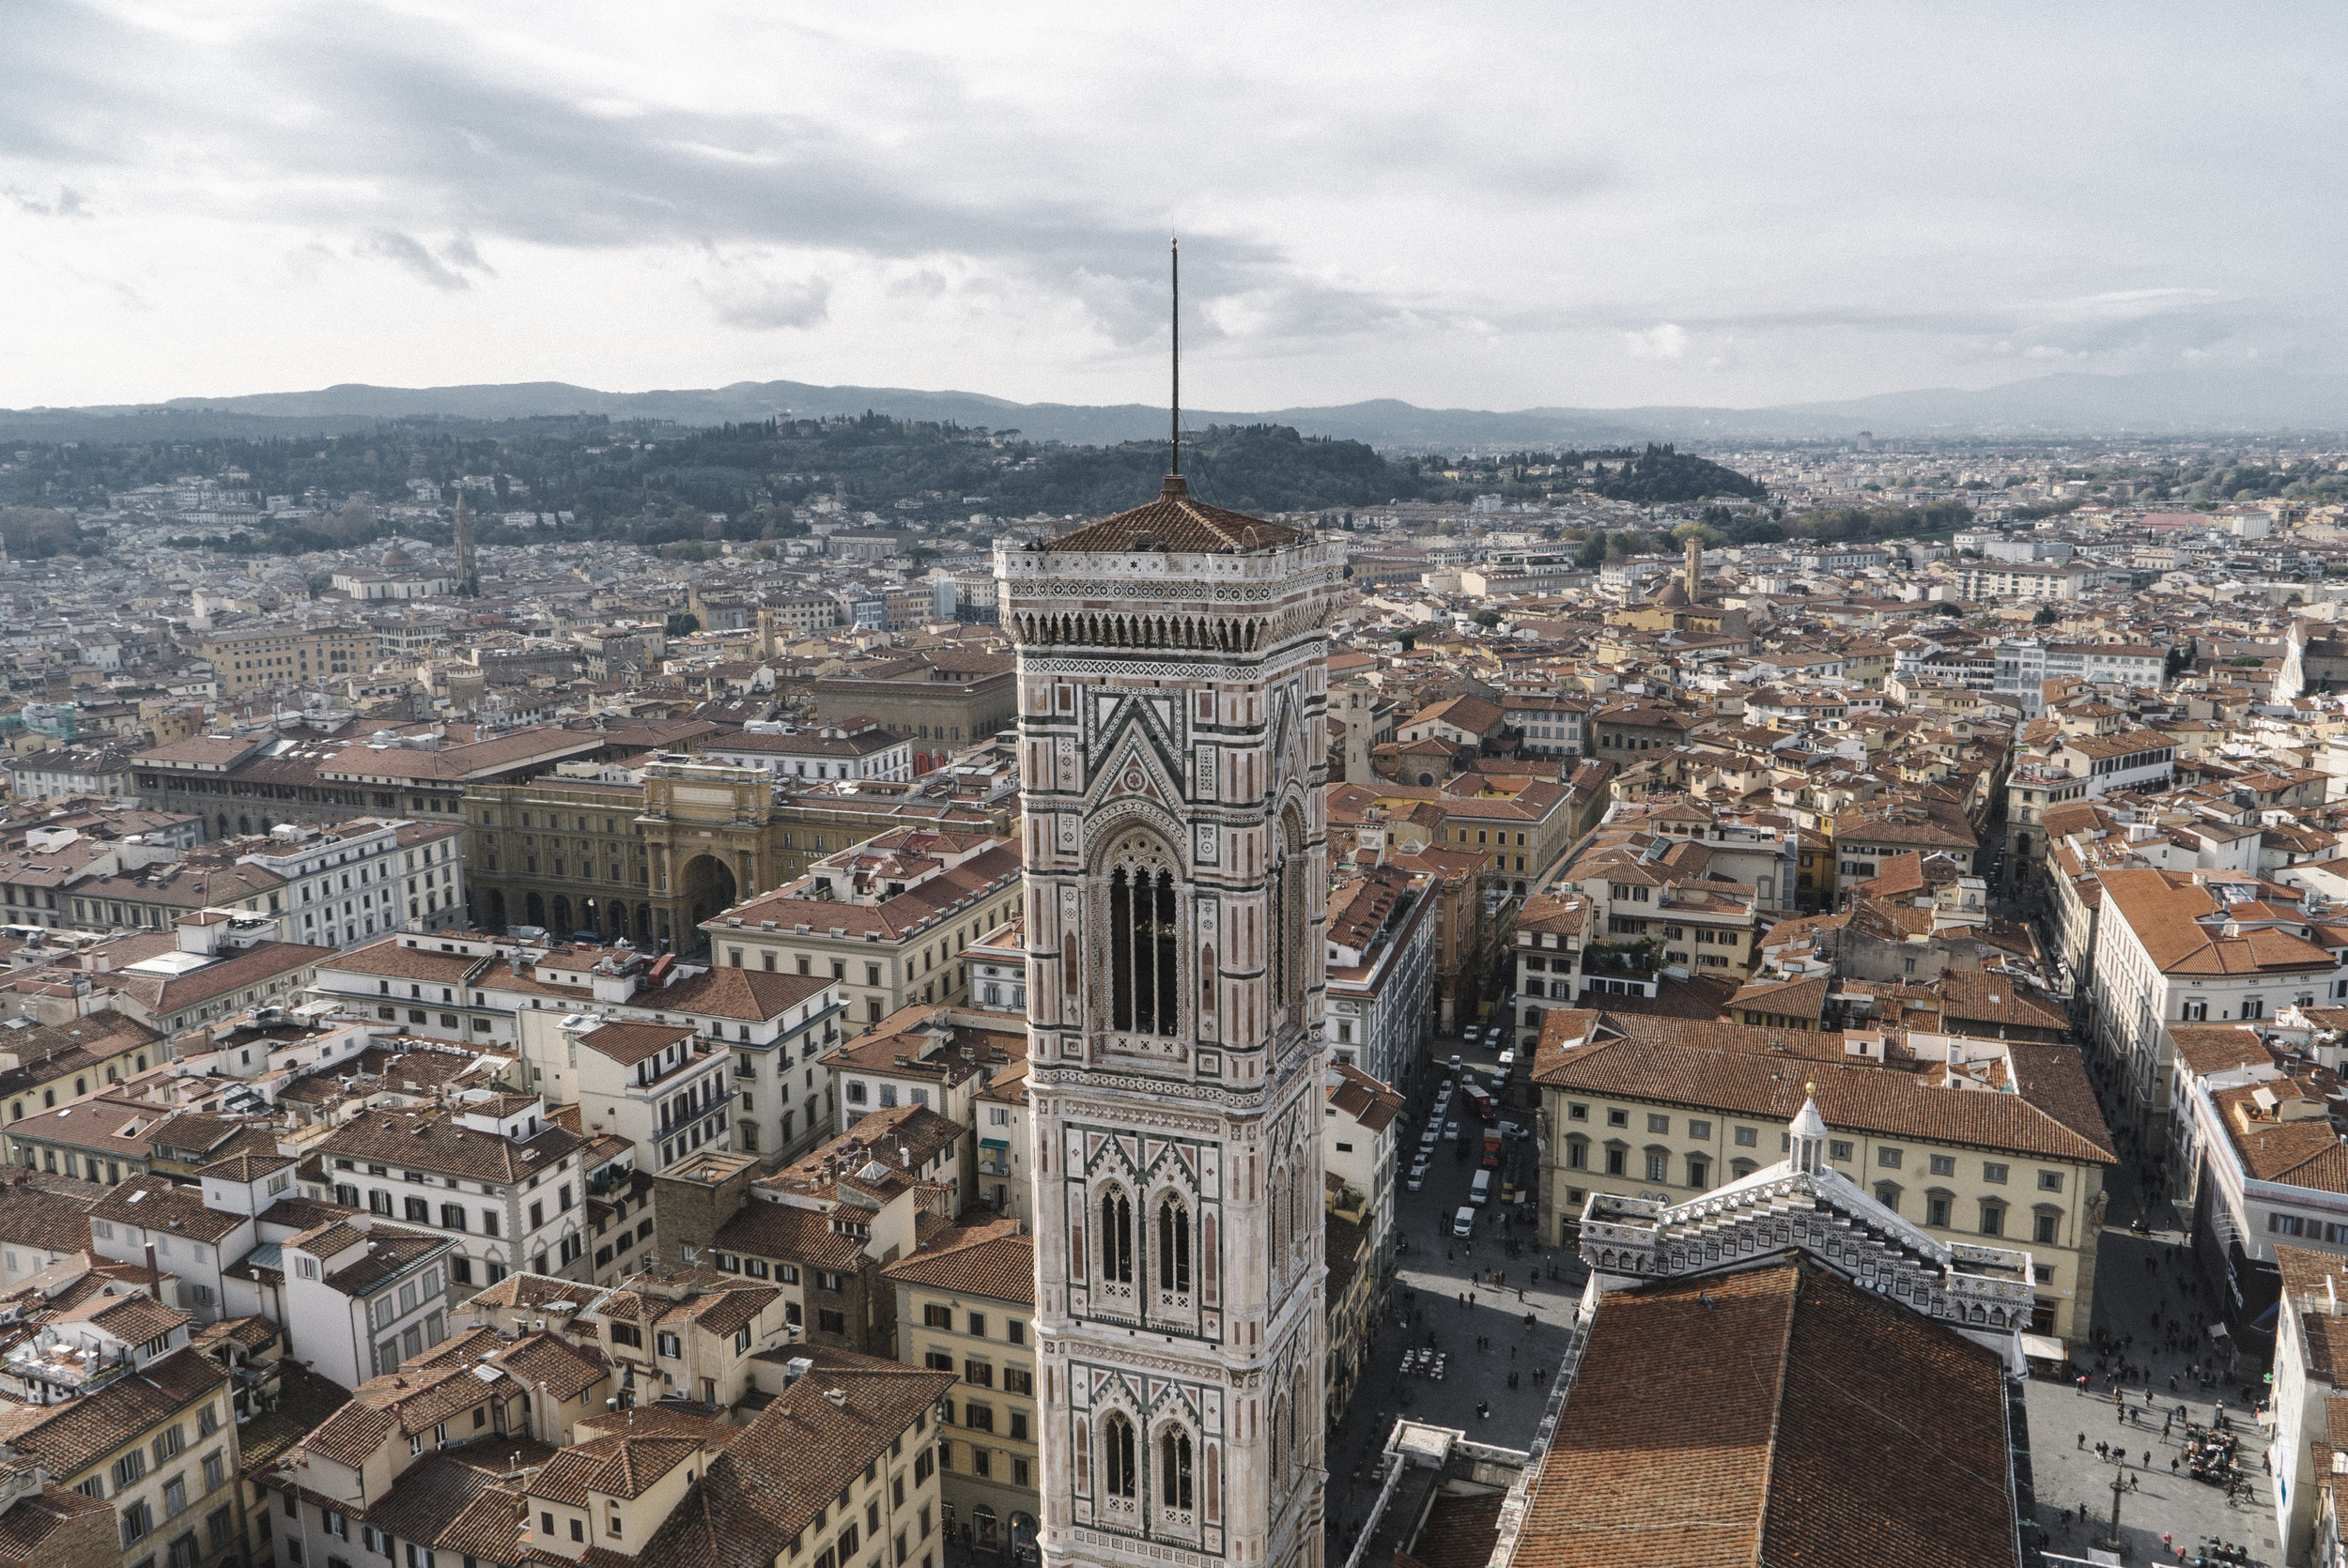 DuomoViewsWide.jpg